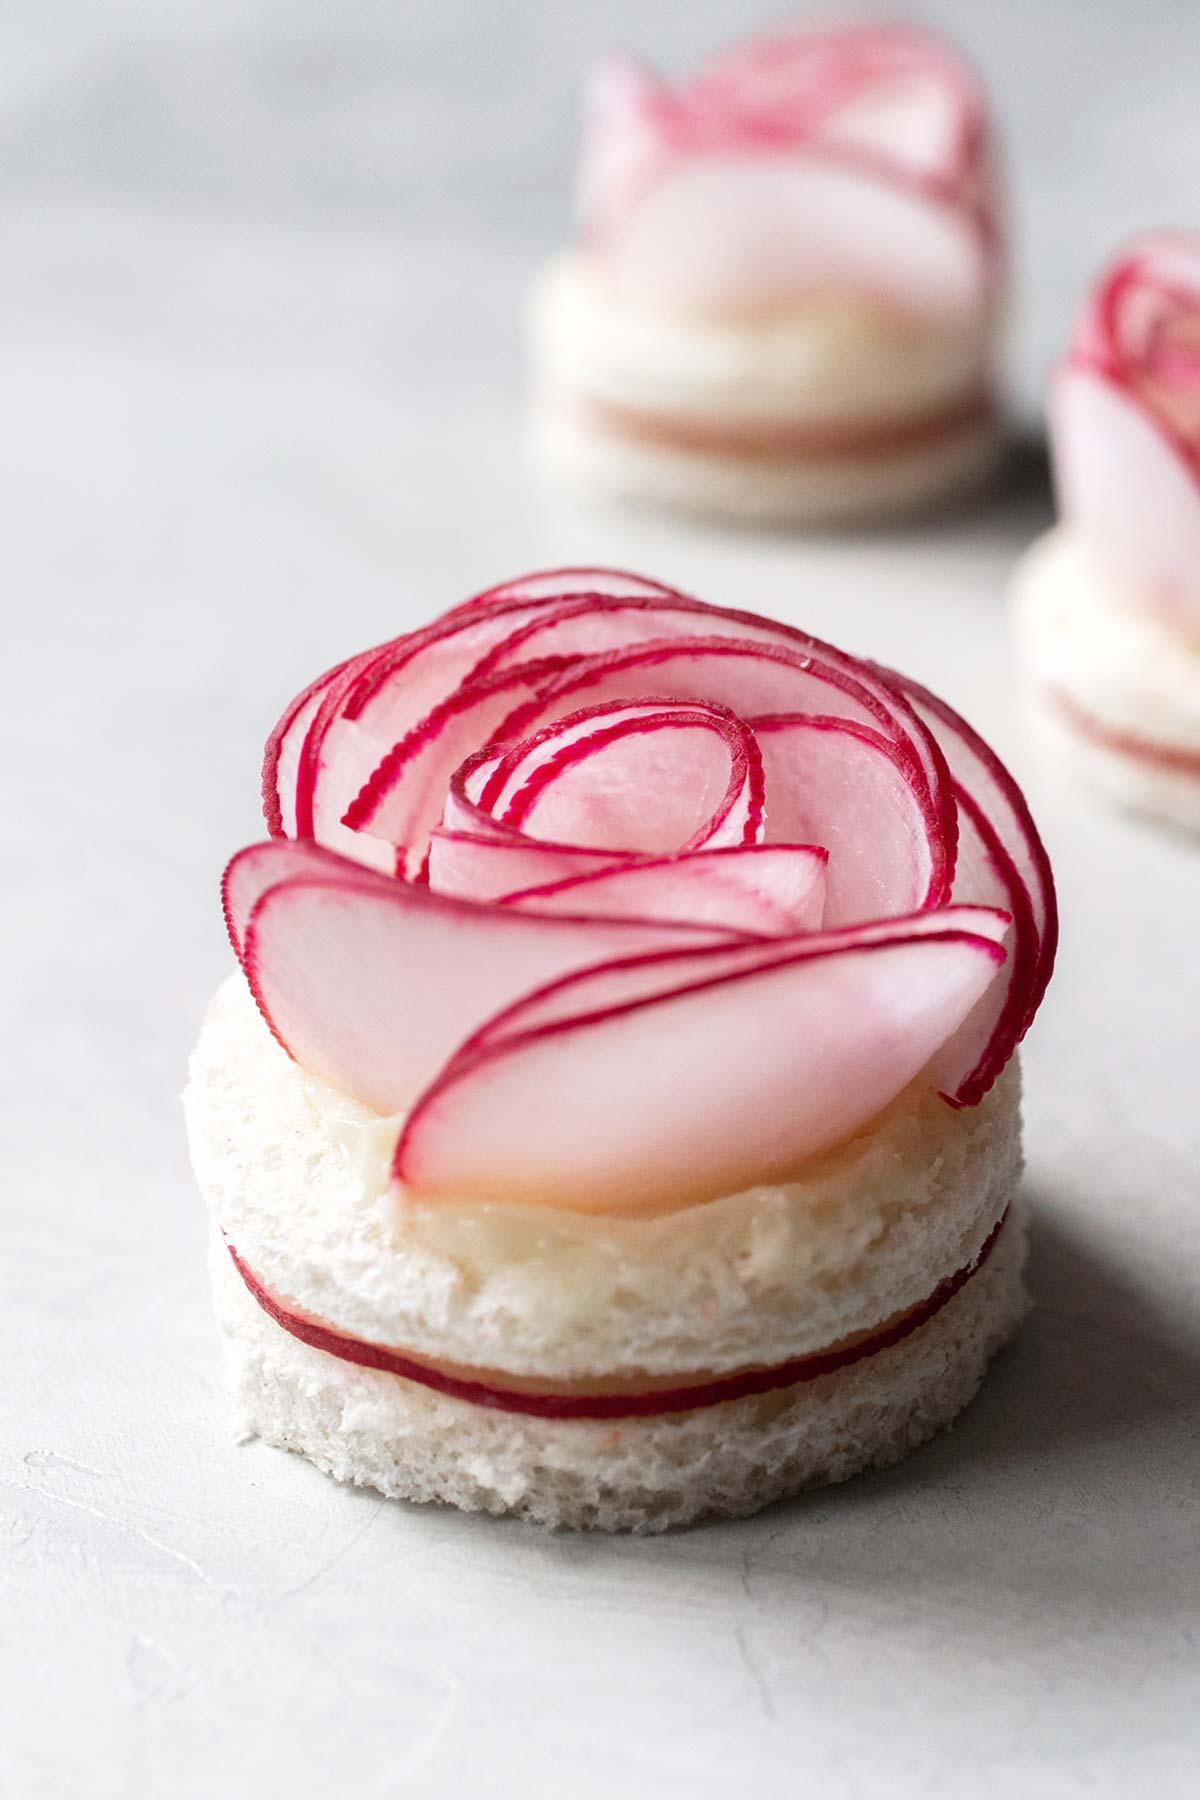 Radish rose tea sandwiches.